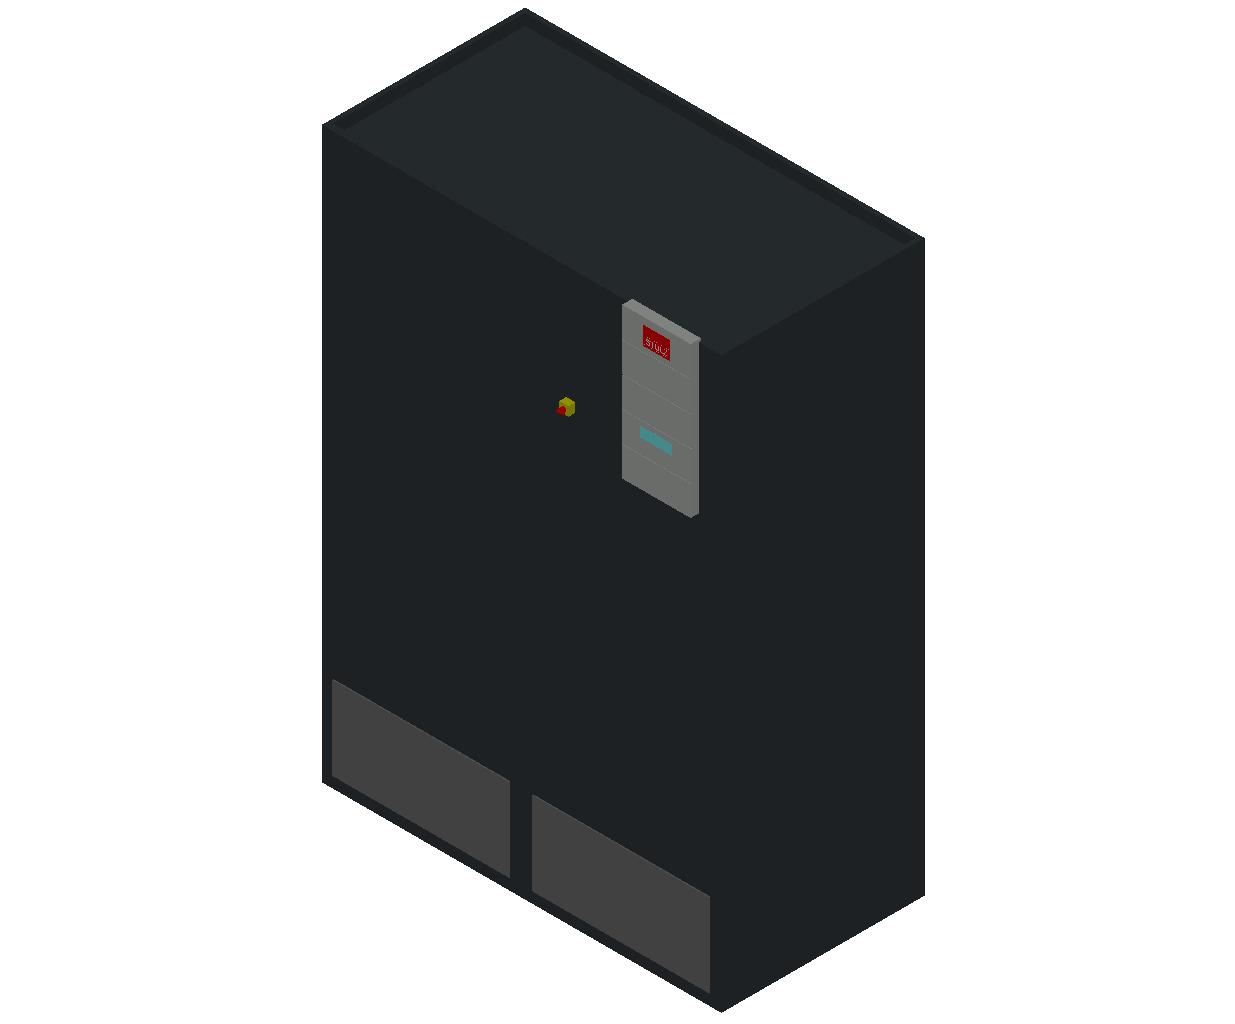 HC_Air Conditioner_Indoor Unit_MEPcontent_STULZ_CyberAir 3PRO_ASR_CW2_ASR_770_CW2_INT-EN.dwg